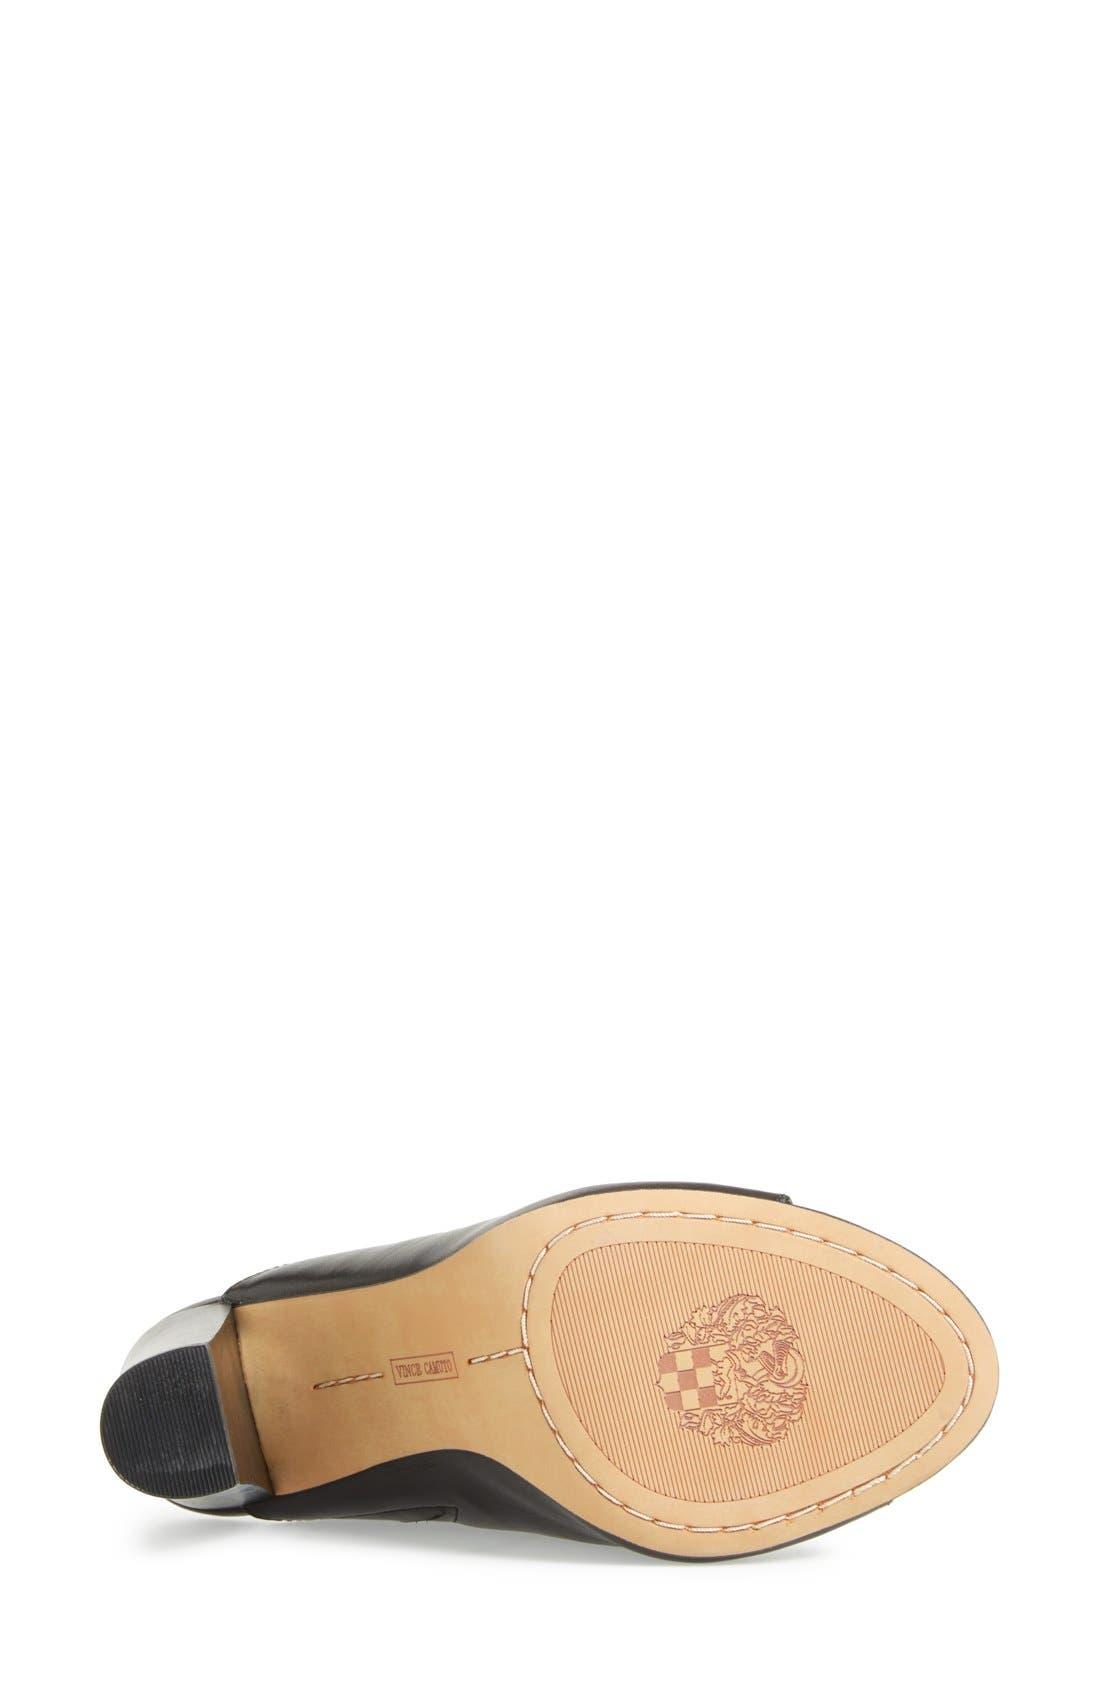 VINCE CAMUTO, 'Vestata' Leather Peep Toe Mule, Alternate thumbnail 5, color, 001